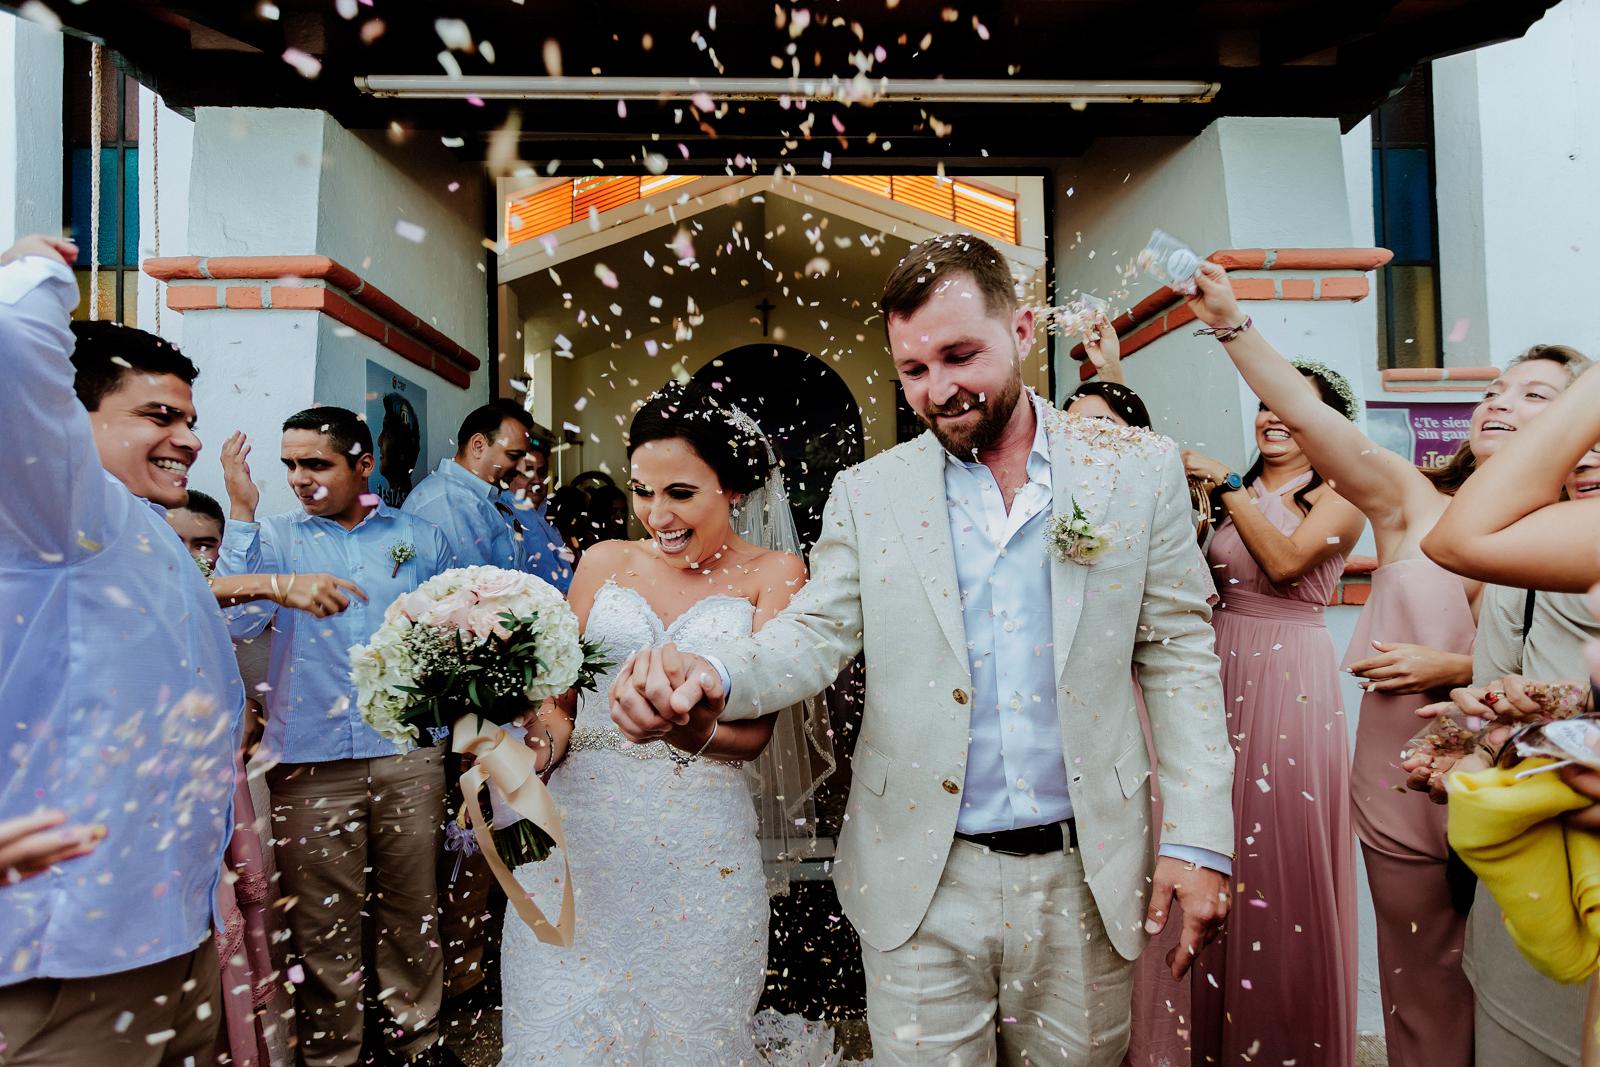 bride-groom-wedding-confetti-church-friends-smile-wedding-vallarta-love